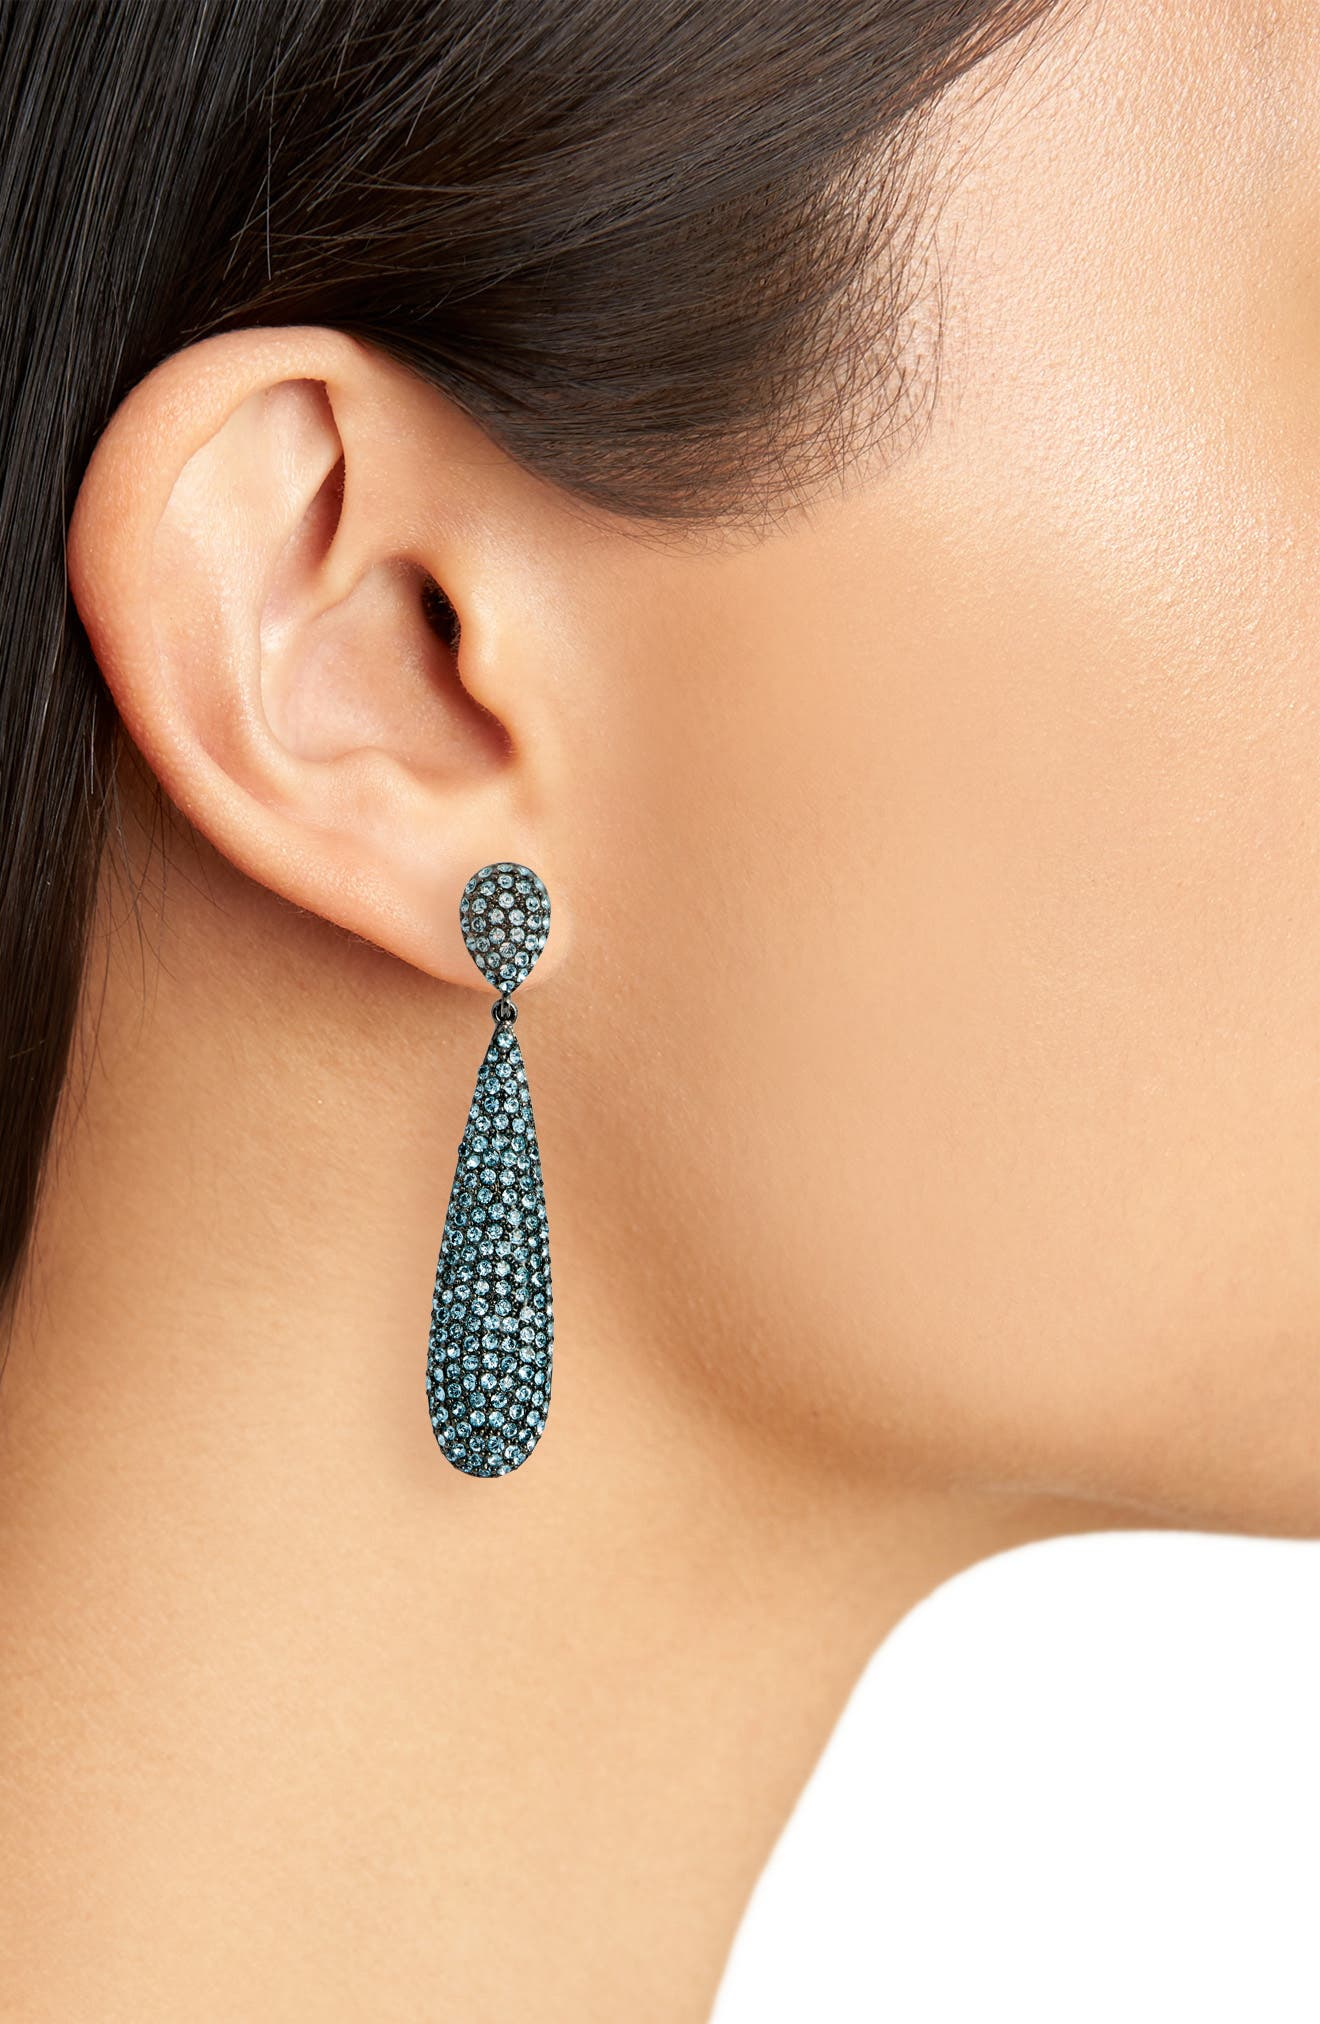 Elongated Pavé Swarovski Crystal Teardrop Earrings,                             Alternate thumbnail 2, color,                             AQUAMARINE/ BLACK SILVER